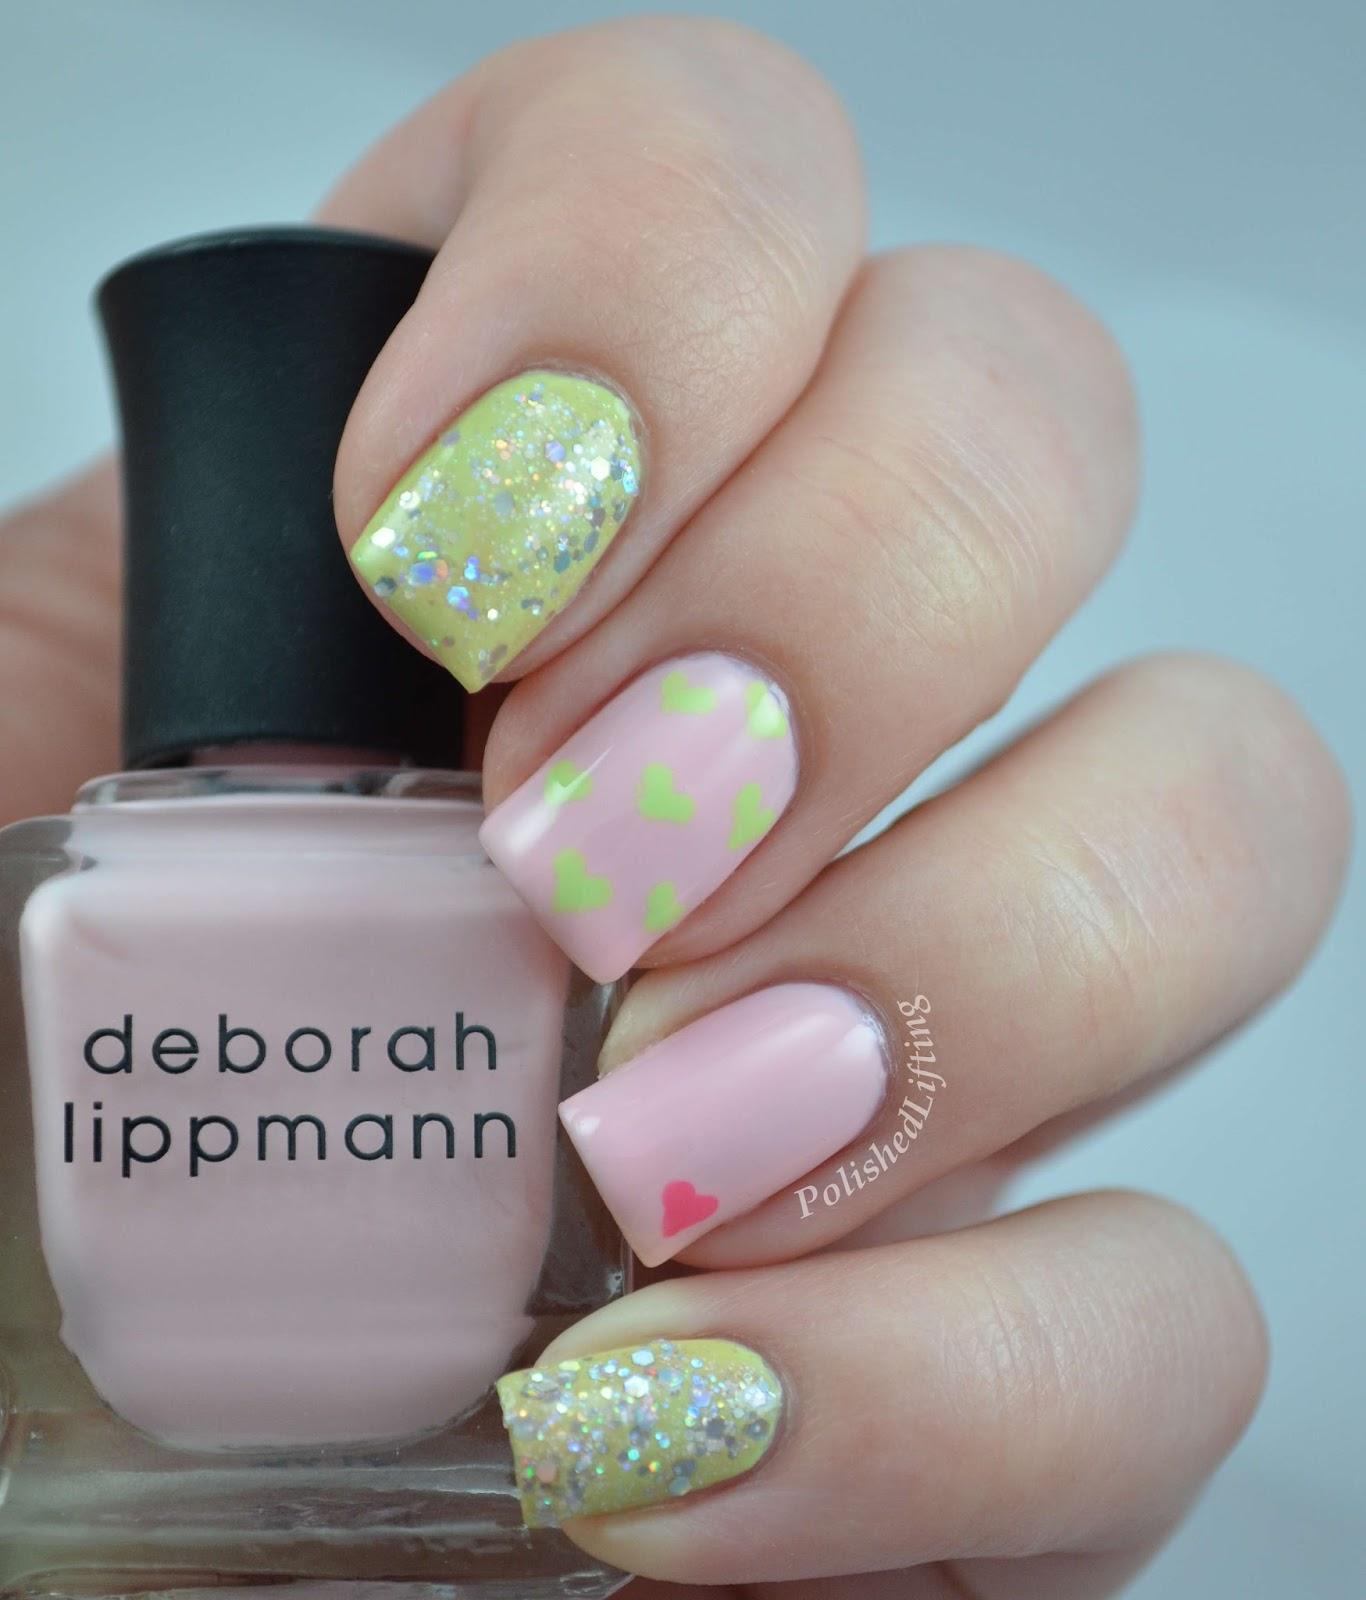 Deborah Lippmann Marnie Break 4 Love Champagne Supernova Spring Buds